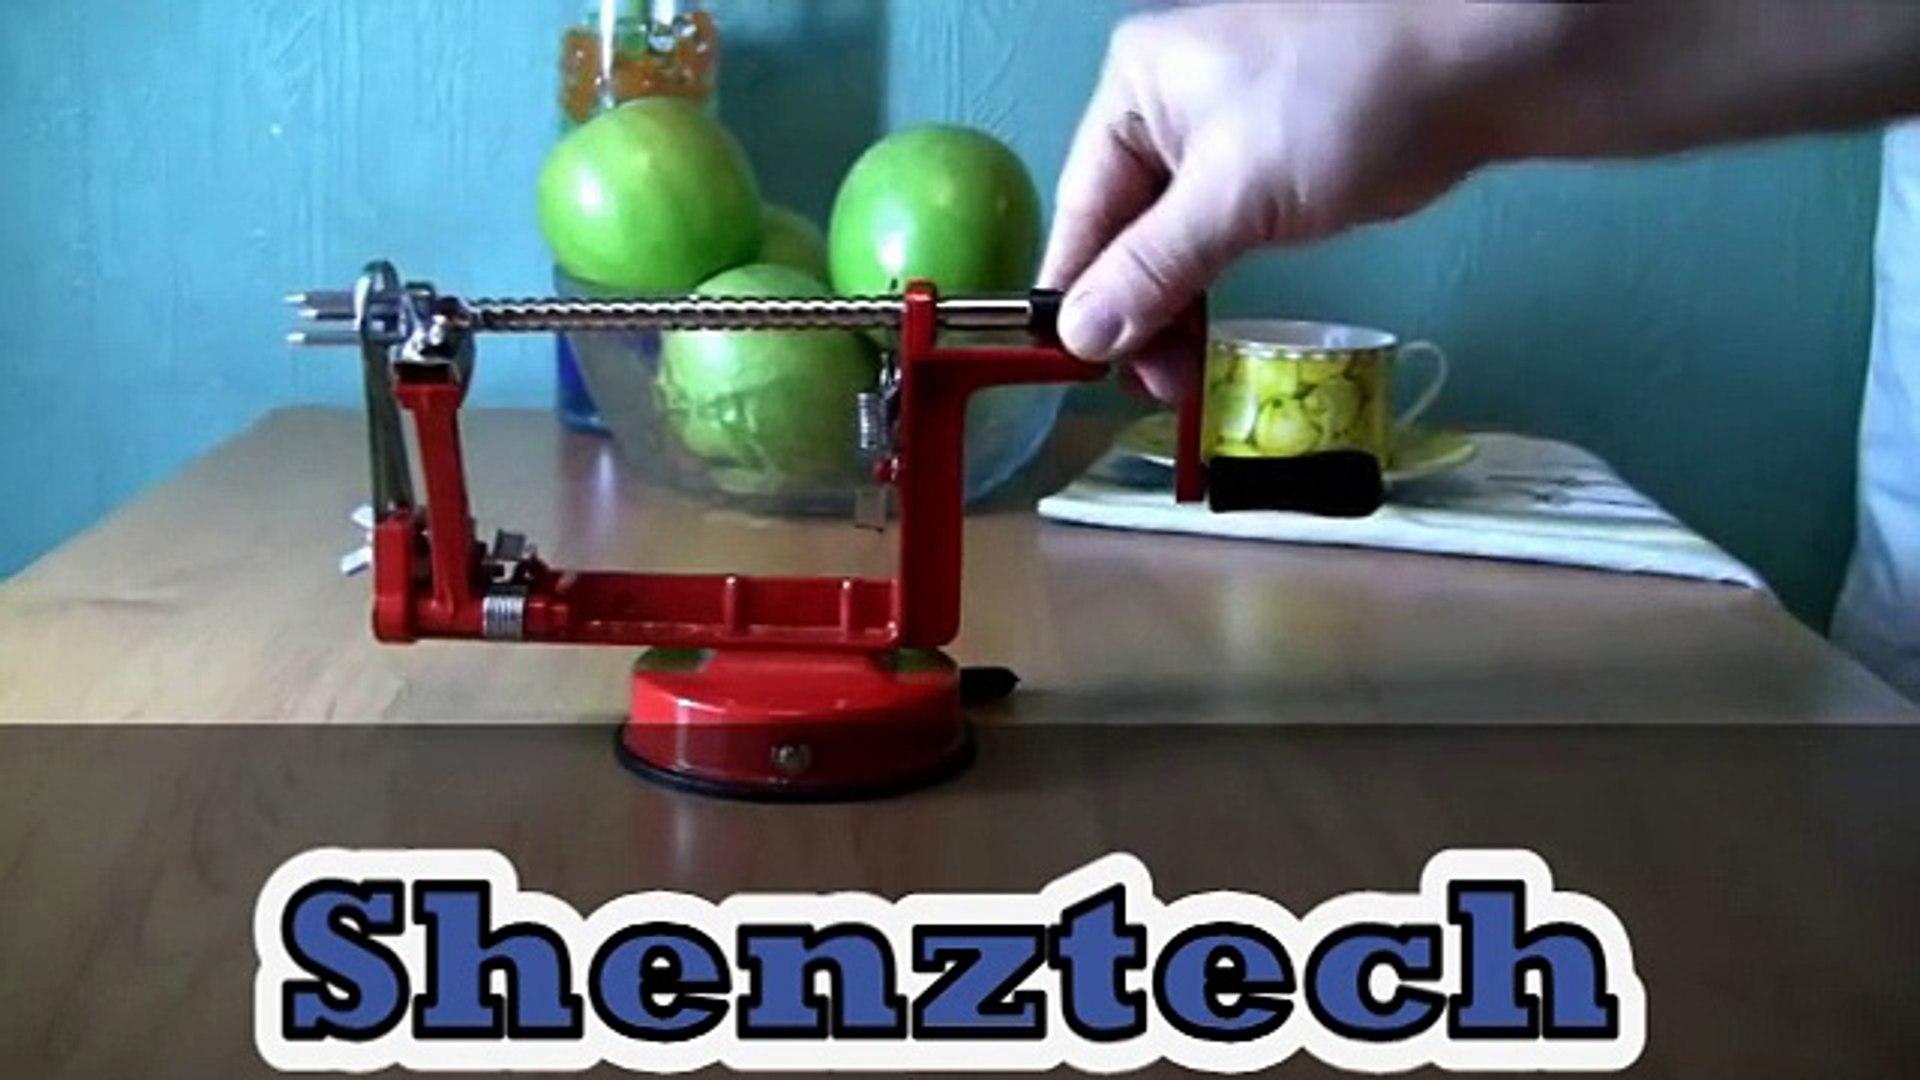 Details about  /New 3 in 1 Apple Pear Peeler Slicer Corer Potato Cutter Kitchen Fruit Dicer